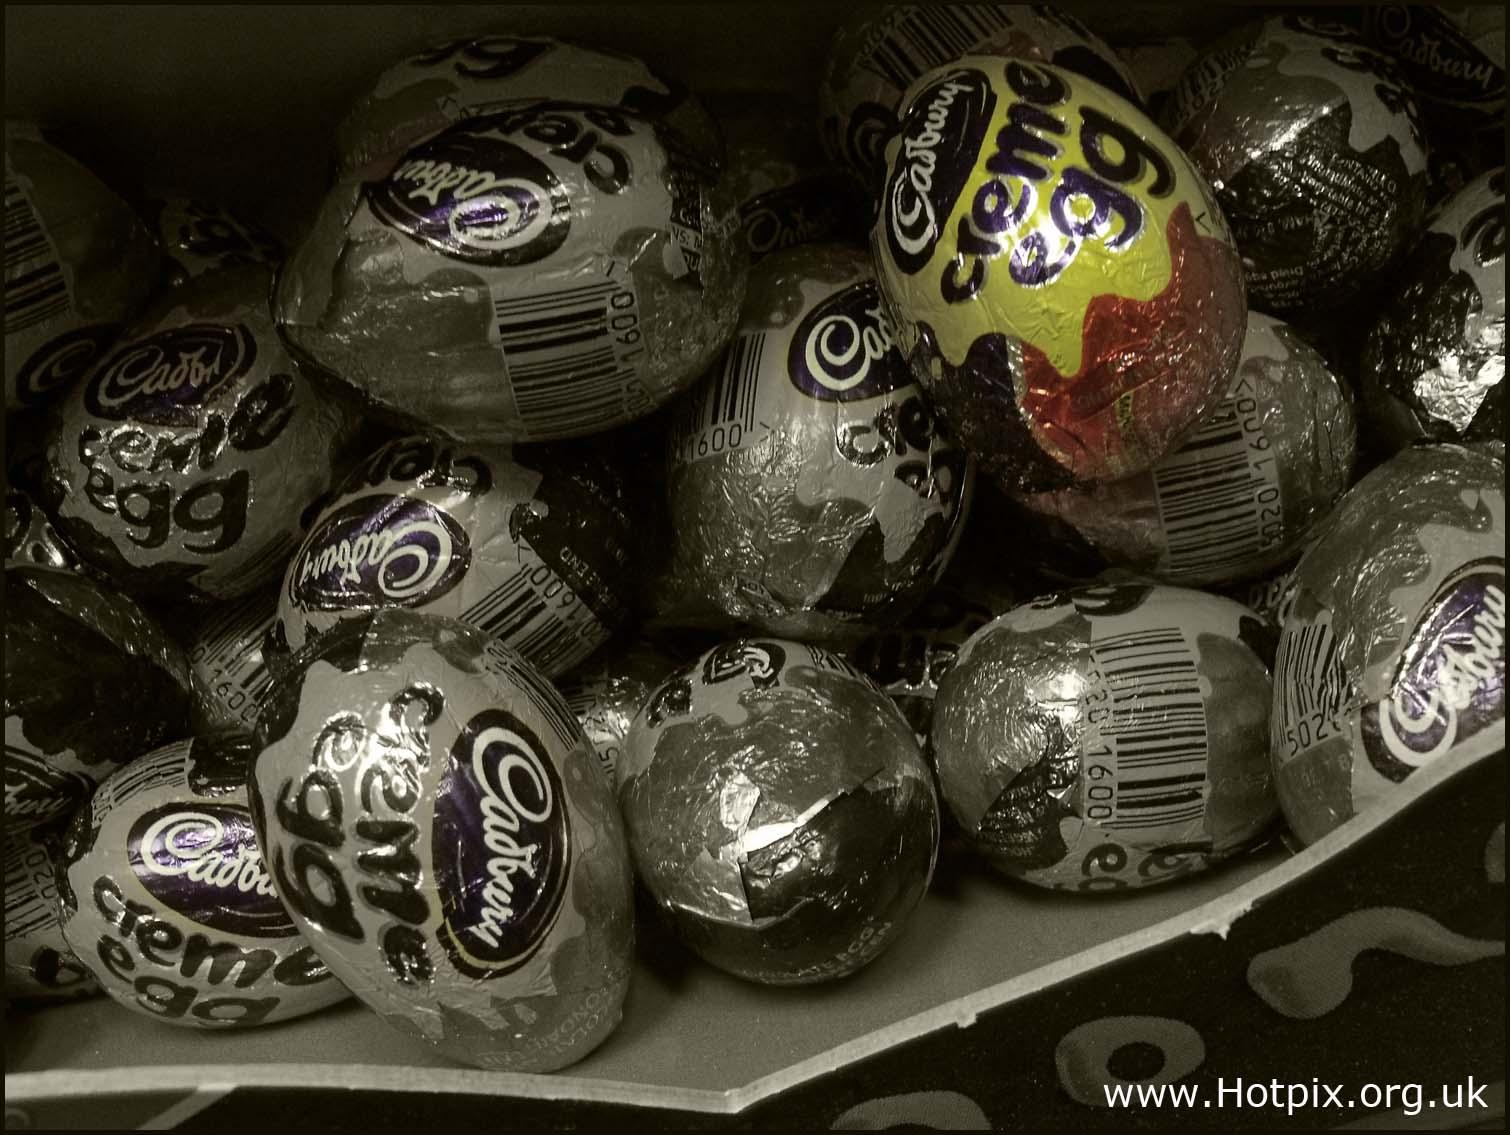 cadbury,creme,cream,egg,easter,chocolate,food,calories,confectio cadbury,confectionry,confectionary,365project,365,project,project365,selective,color,colour,black,white,mono,toned,sepia,stillife,stilllife,still,life,selectivo,couleur,s\u00e9lective,vorgew\u00e4hlte,Farbe,sex,sexy,hotpix!